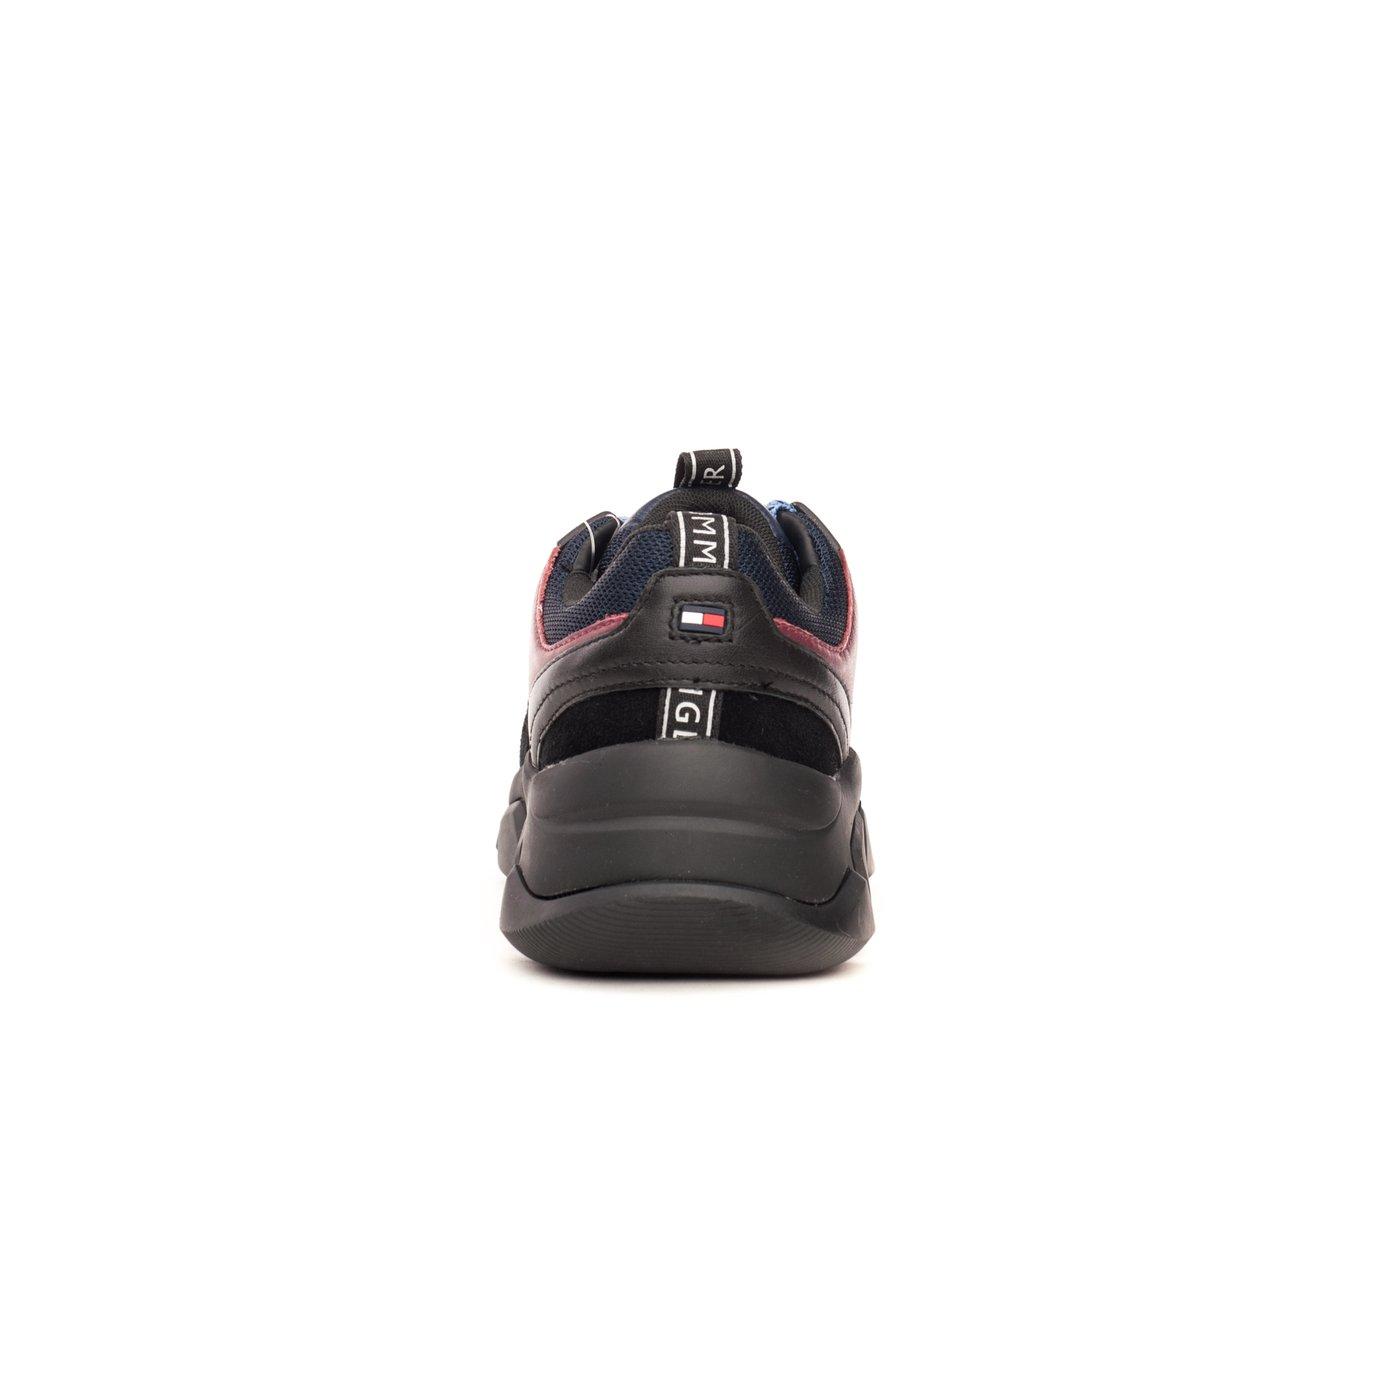 Кросівки жіночі Tommy Hilfiger COSY CHUNKY